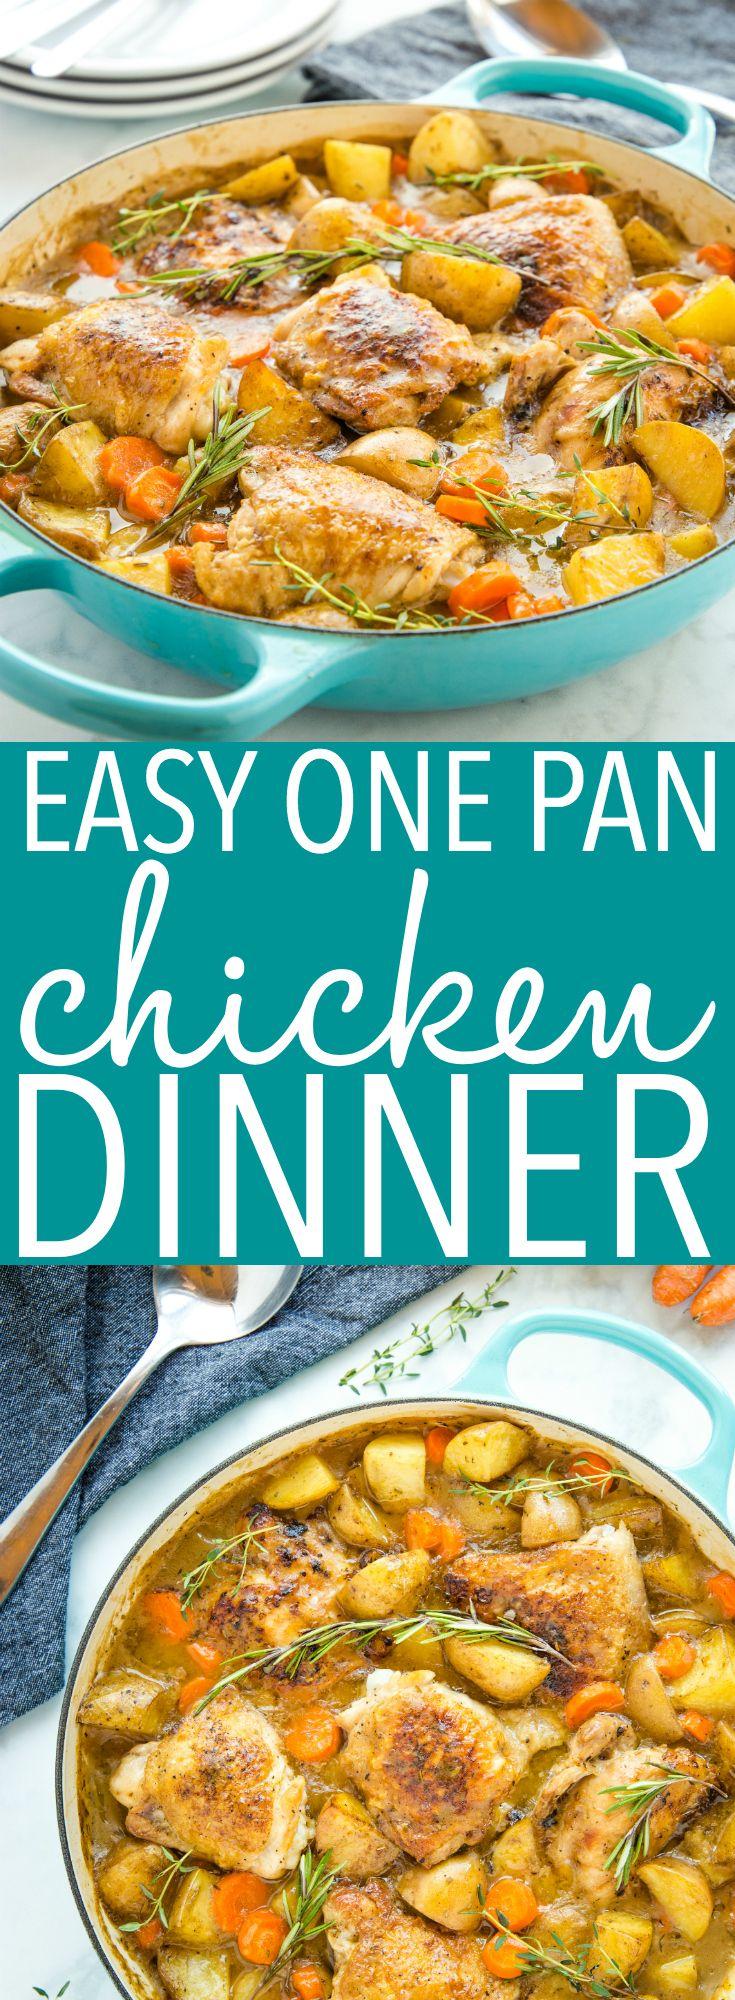 Easy One Pot Roasted Chicken Dinner #dinnerrecipesforfamilymaindishes